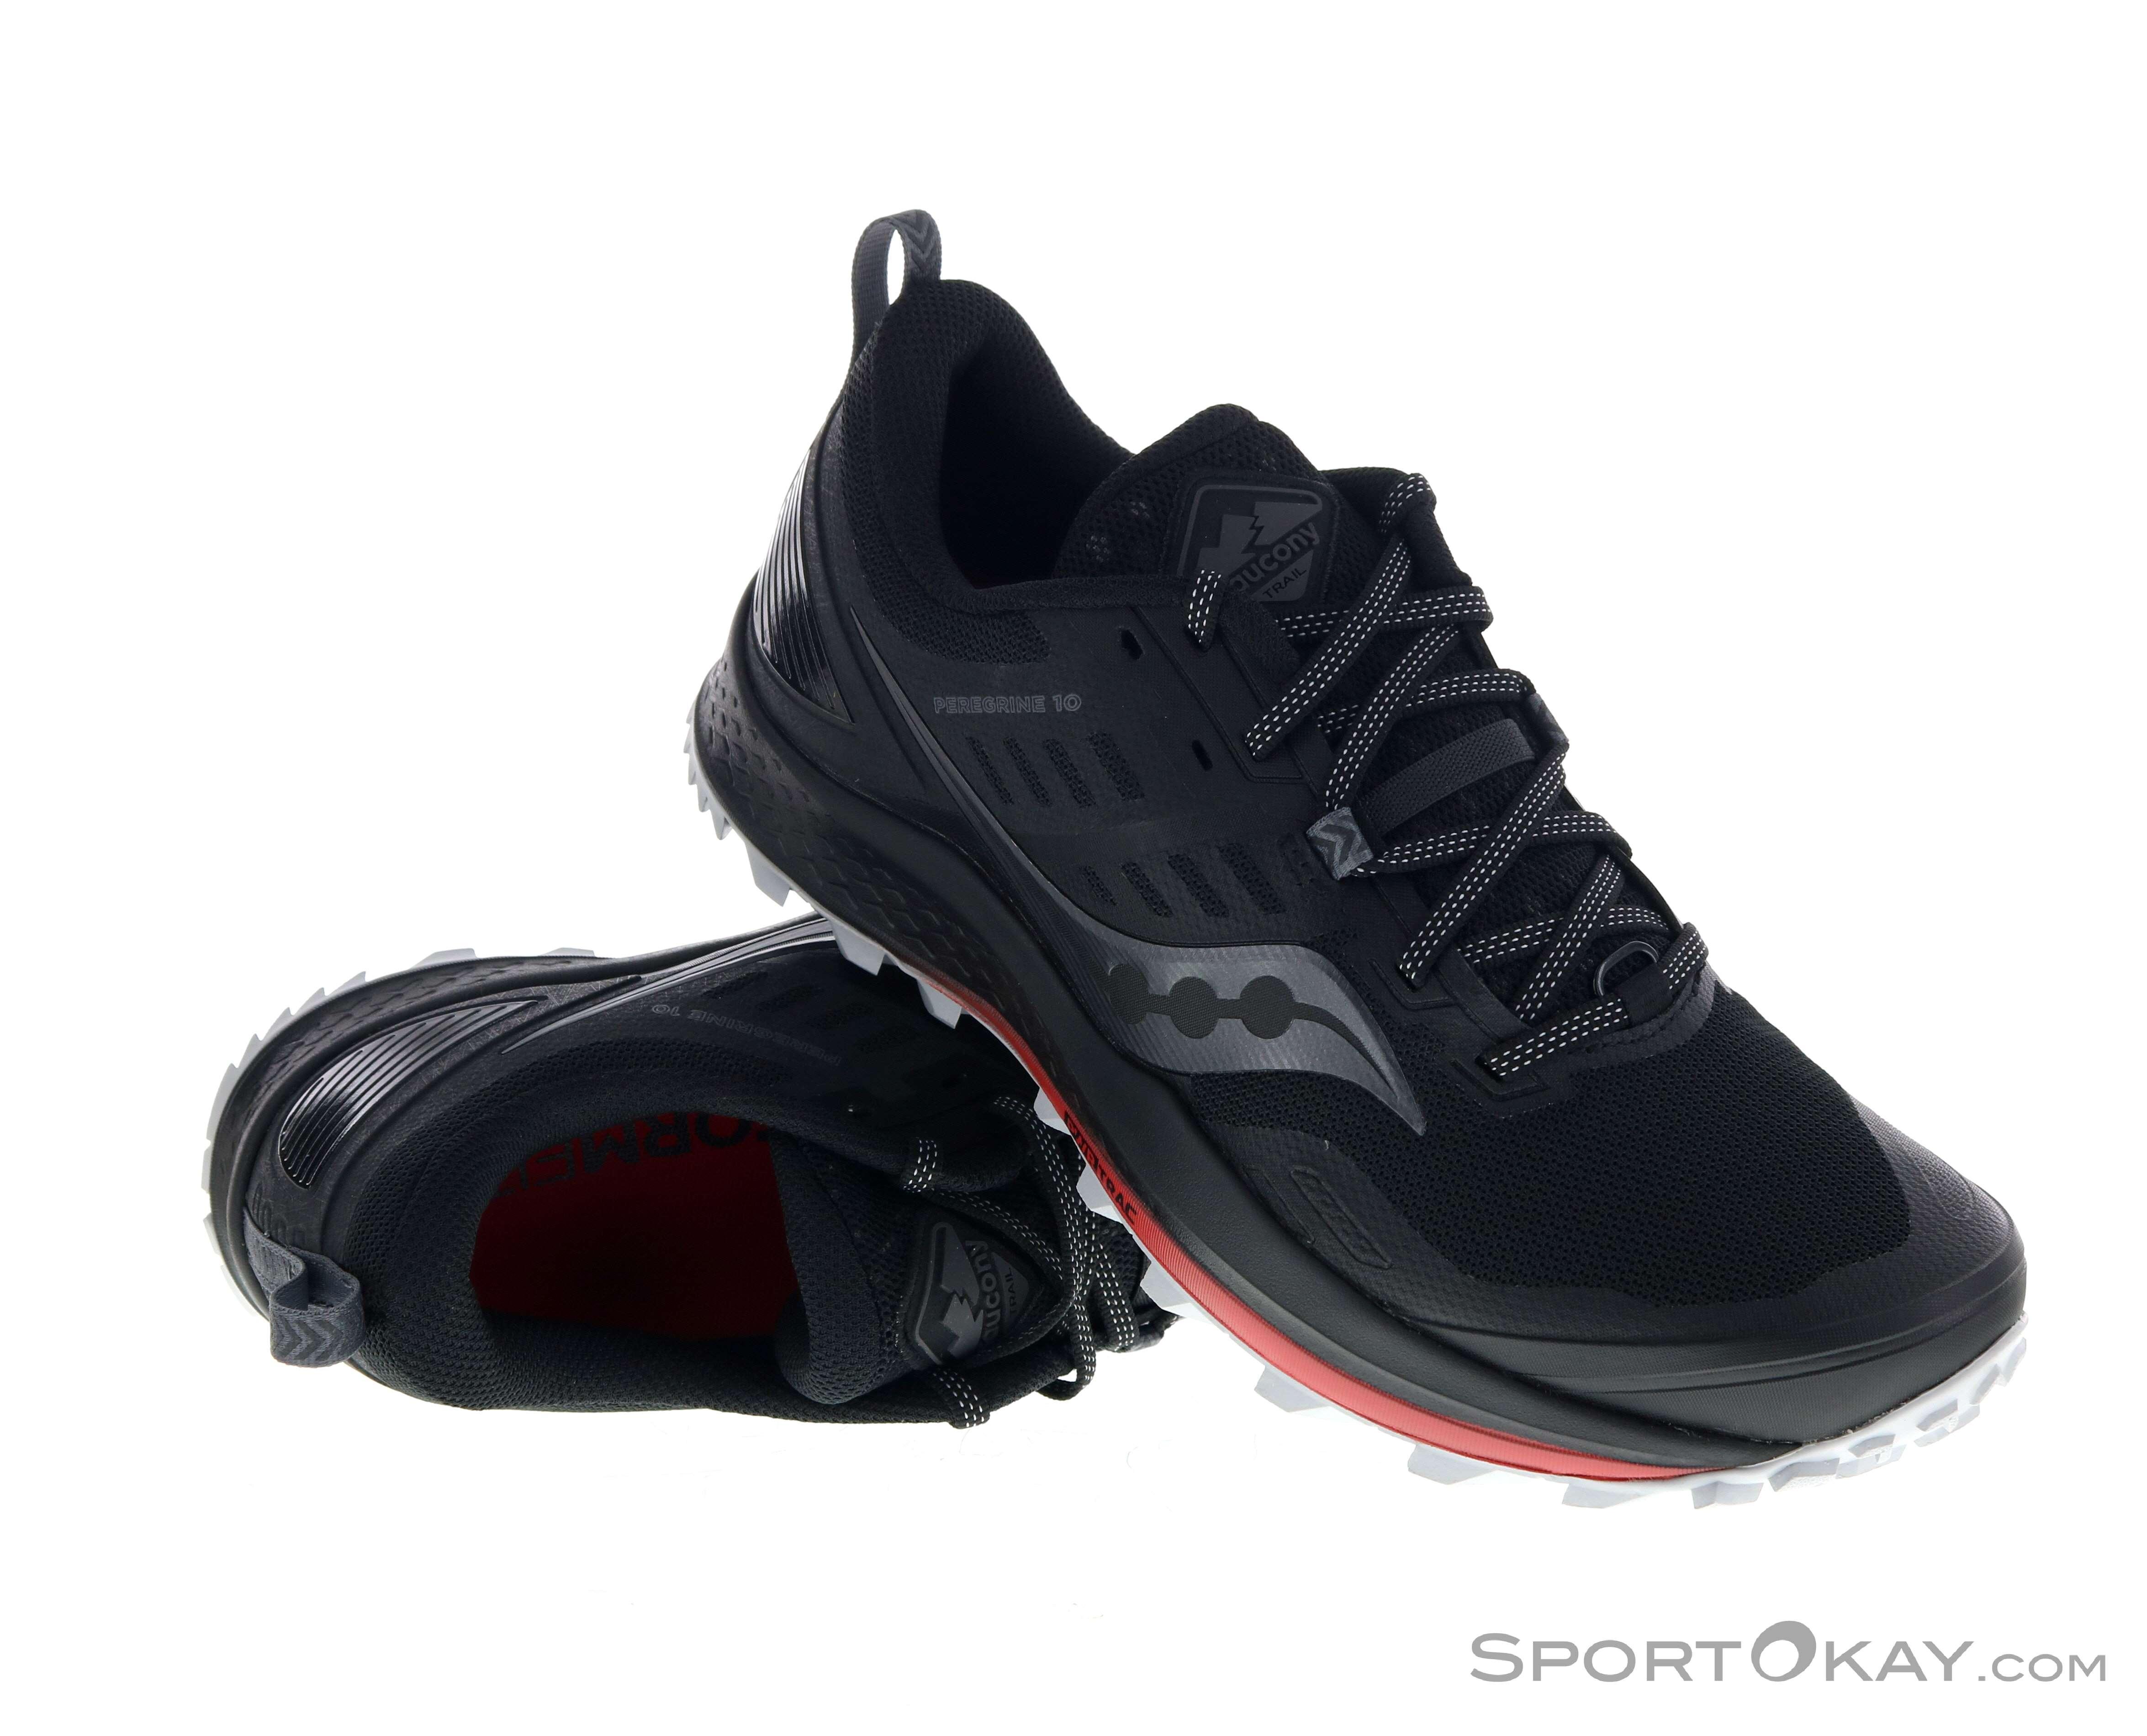 Saucony Peregrine 10 Mens Trail Running